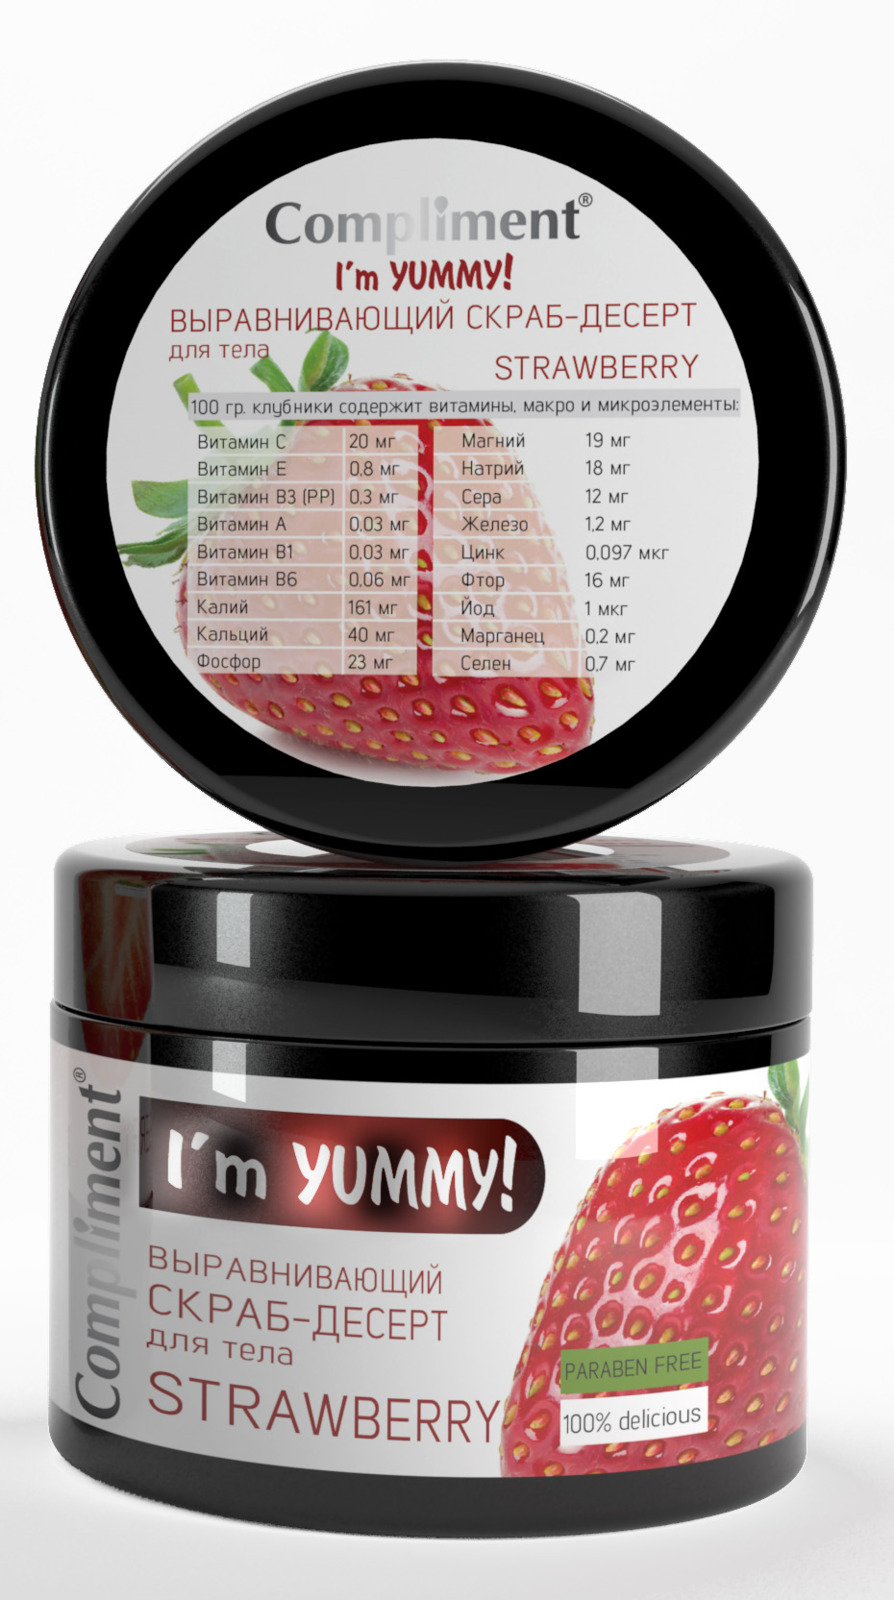 Скраб-десерт для тела Compliment Yummy Strawberry, выравнивающий, 300 мл Compliment